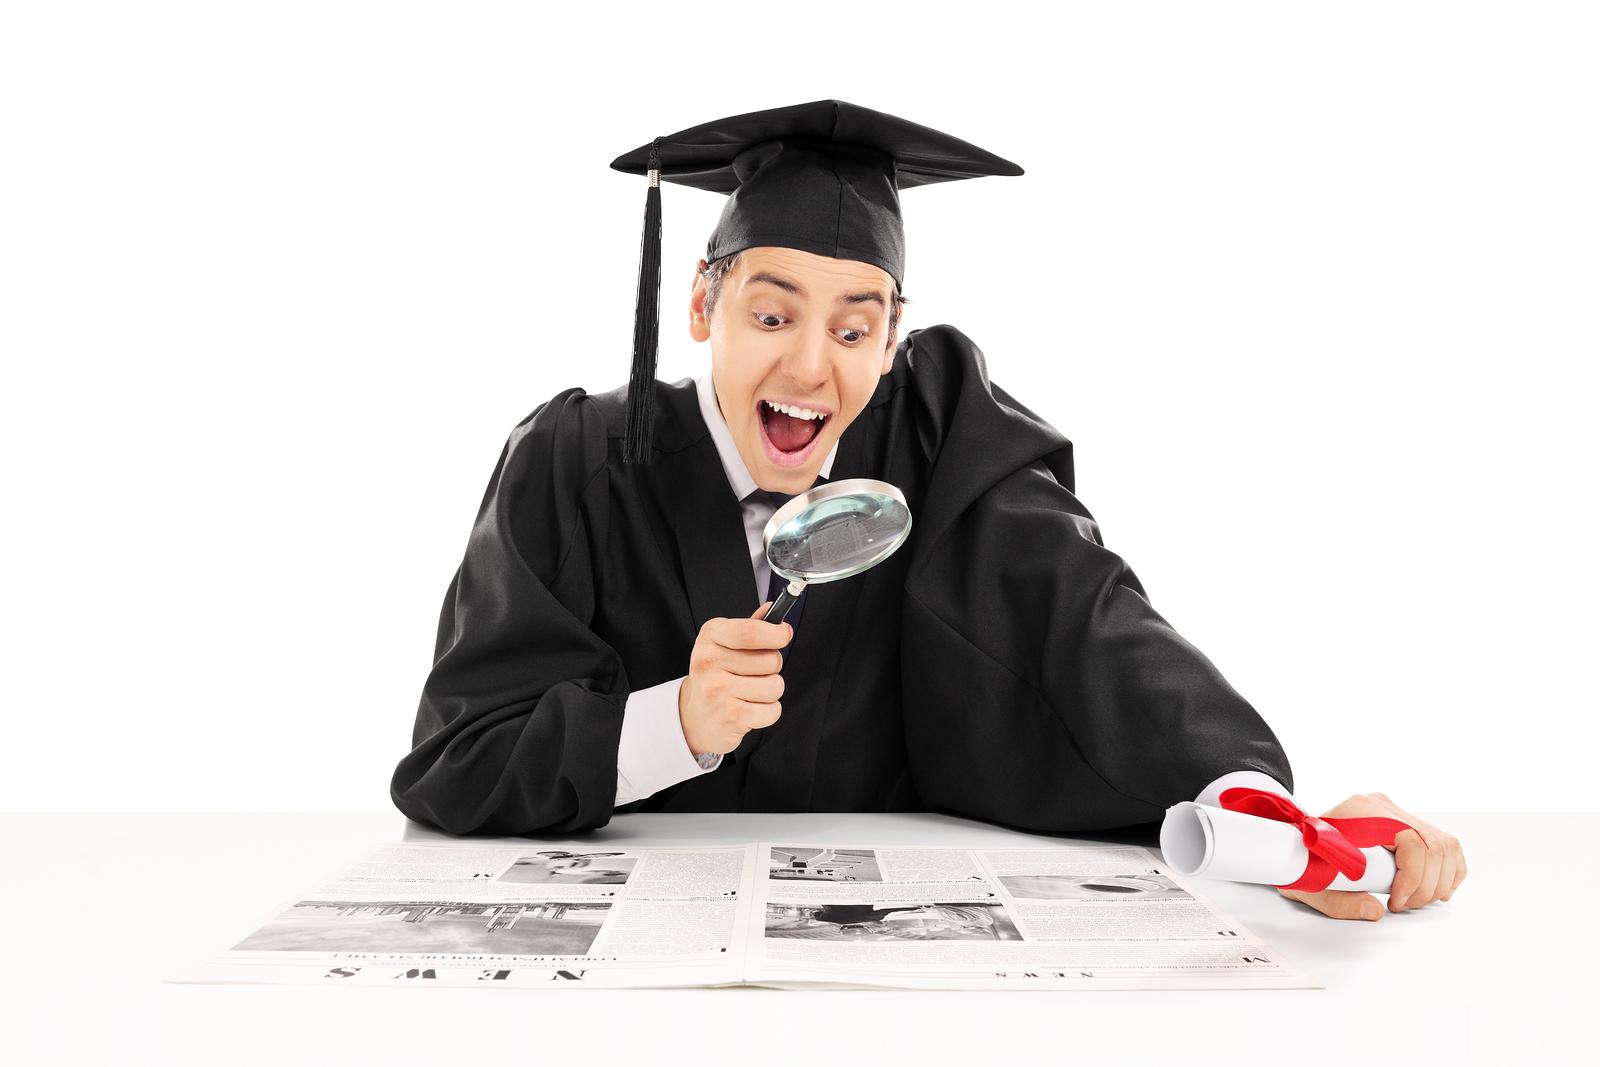 recent college graduate job search